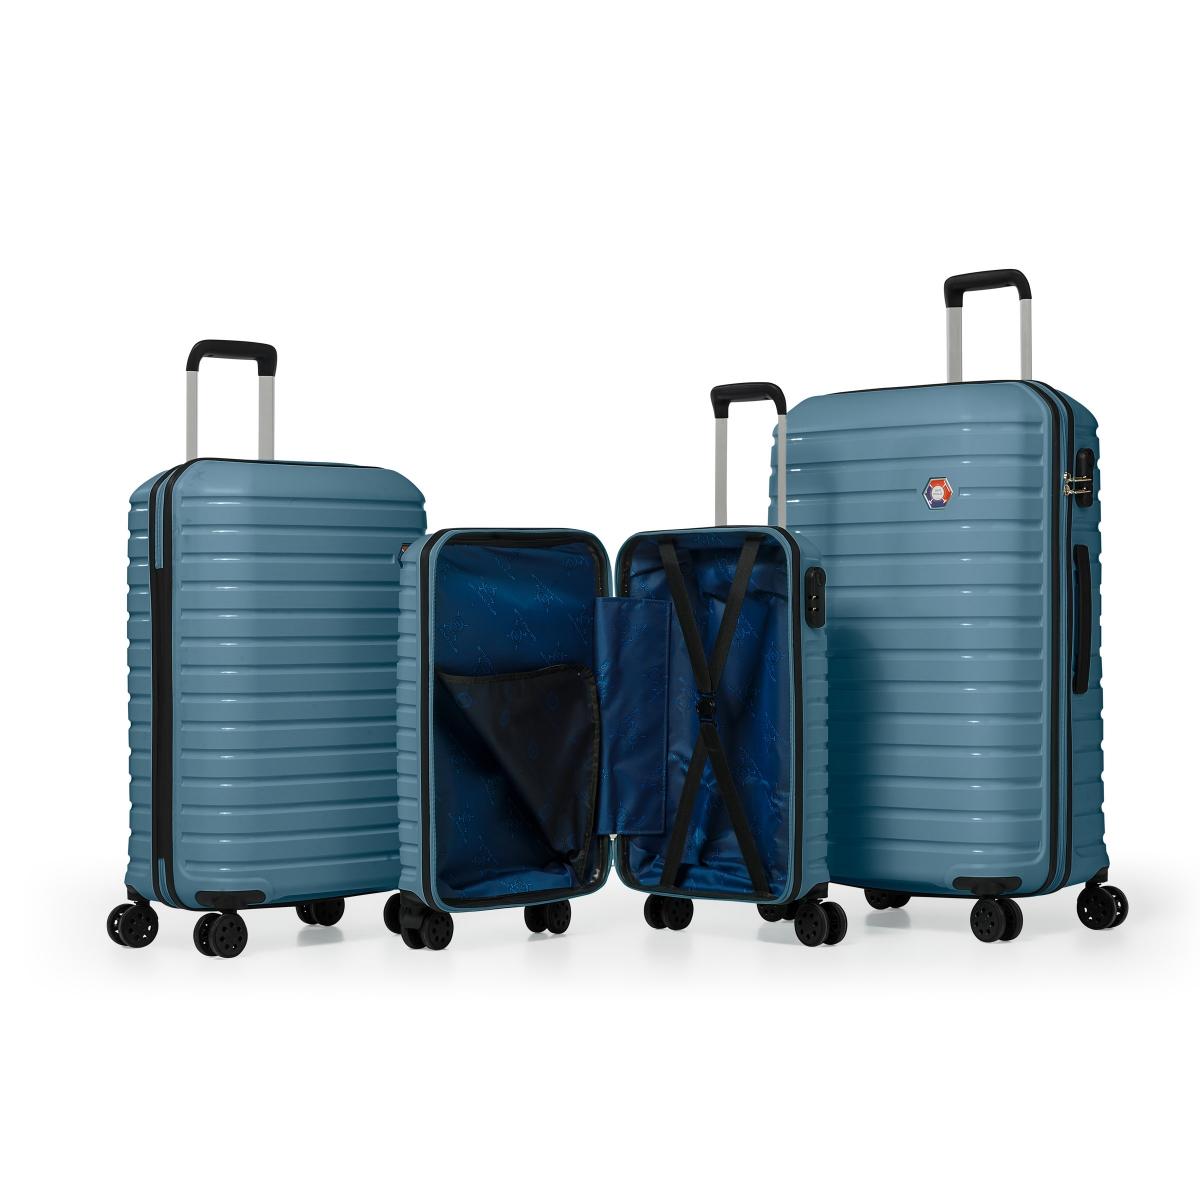 G&D Polo Suitcase PP Enjeksiyon 3'lü Valiz Seyahat Seti - Model 400.18 Tahiti